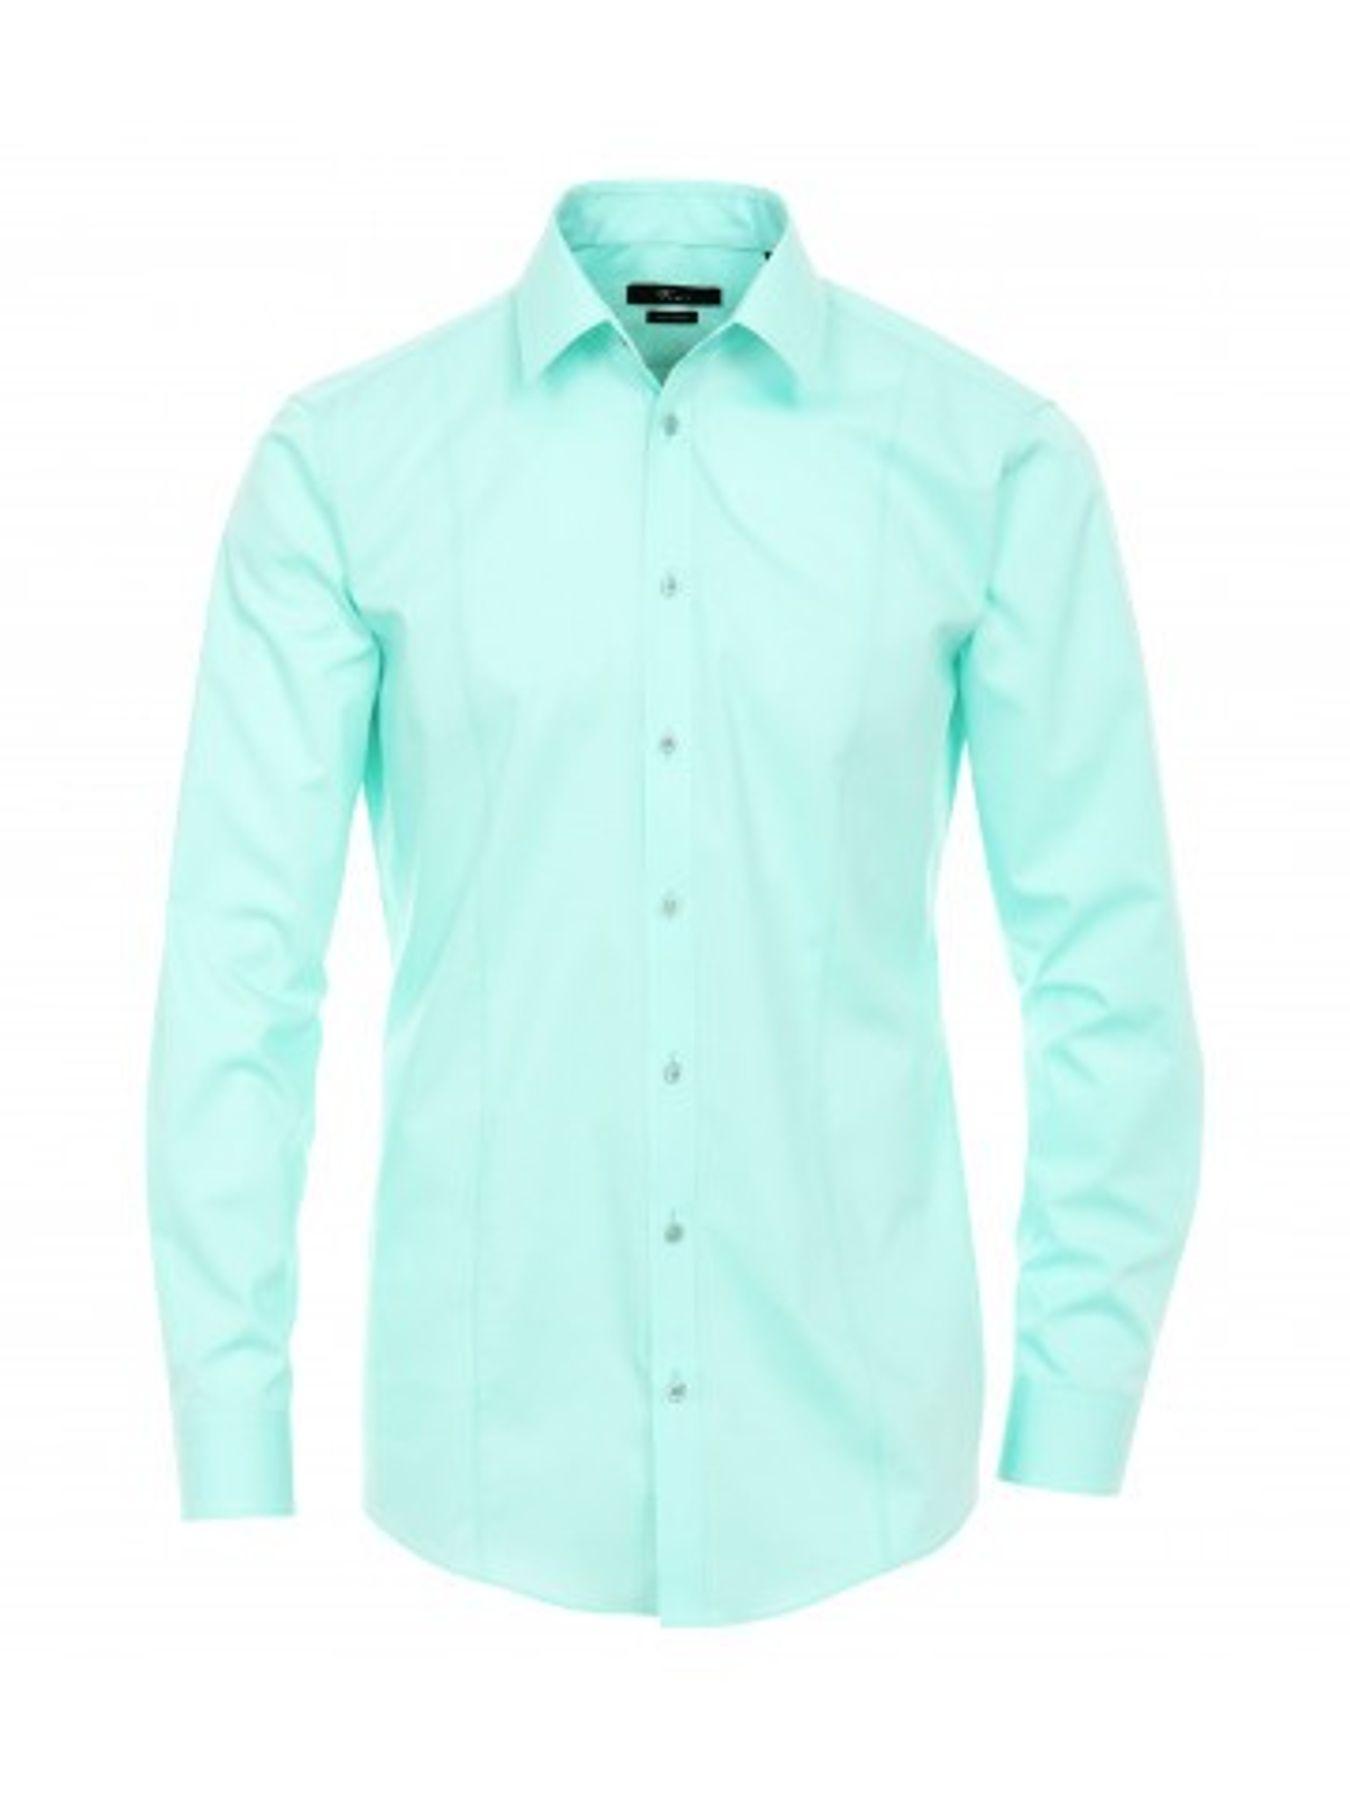 Venti - Body Fit/Super Slim Fit - Bügelfreies Herren Langarm Hemd in diversen Farben (001470) – Bild 23